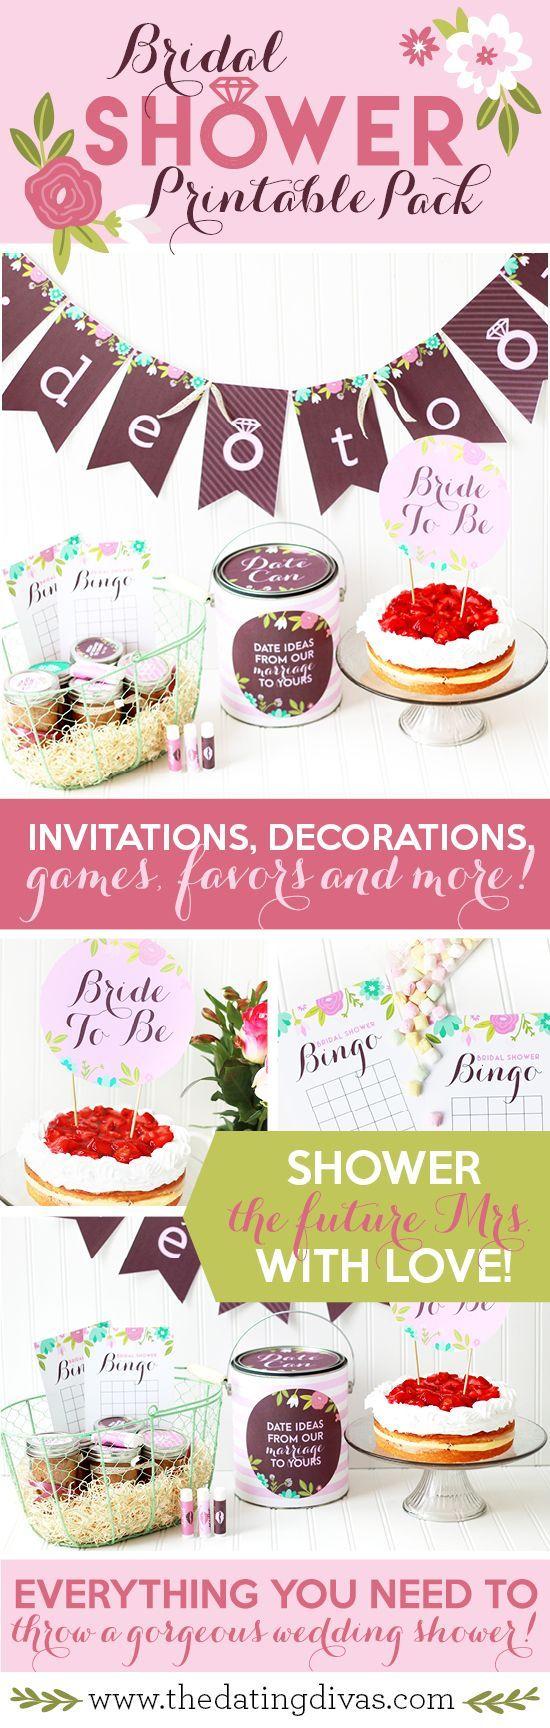 76 best Wedding Ideas images on Pinterest | Bridal parties, Bridal ...